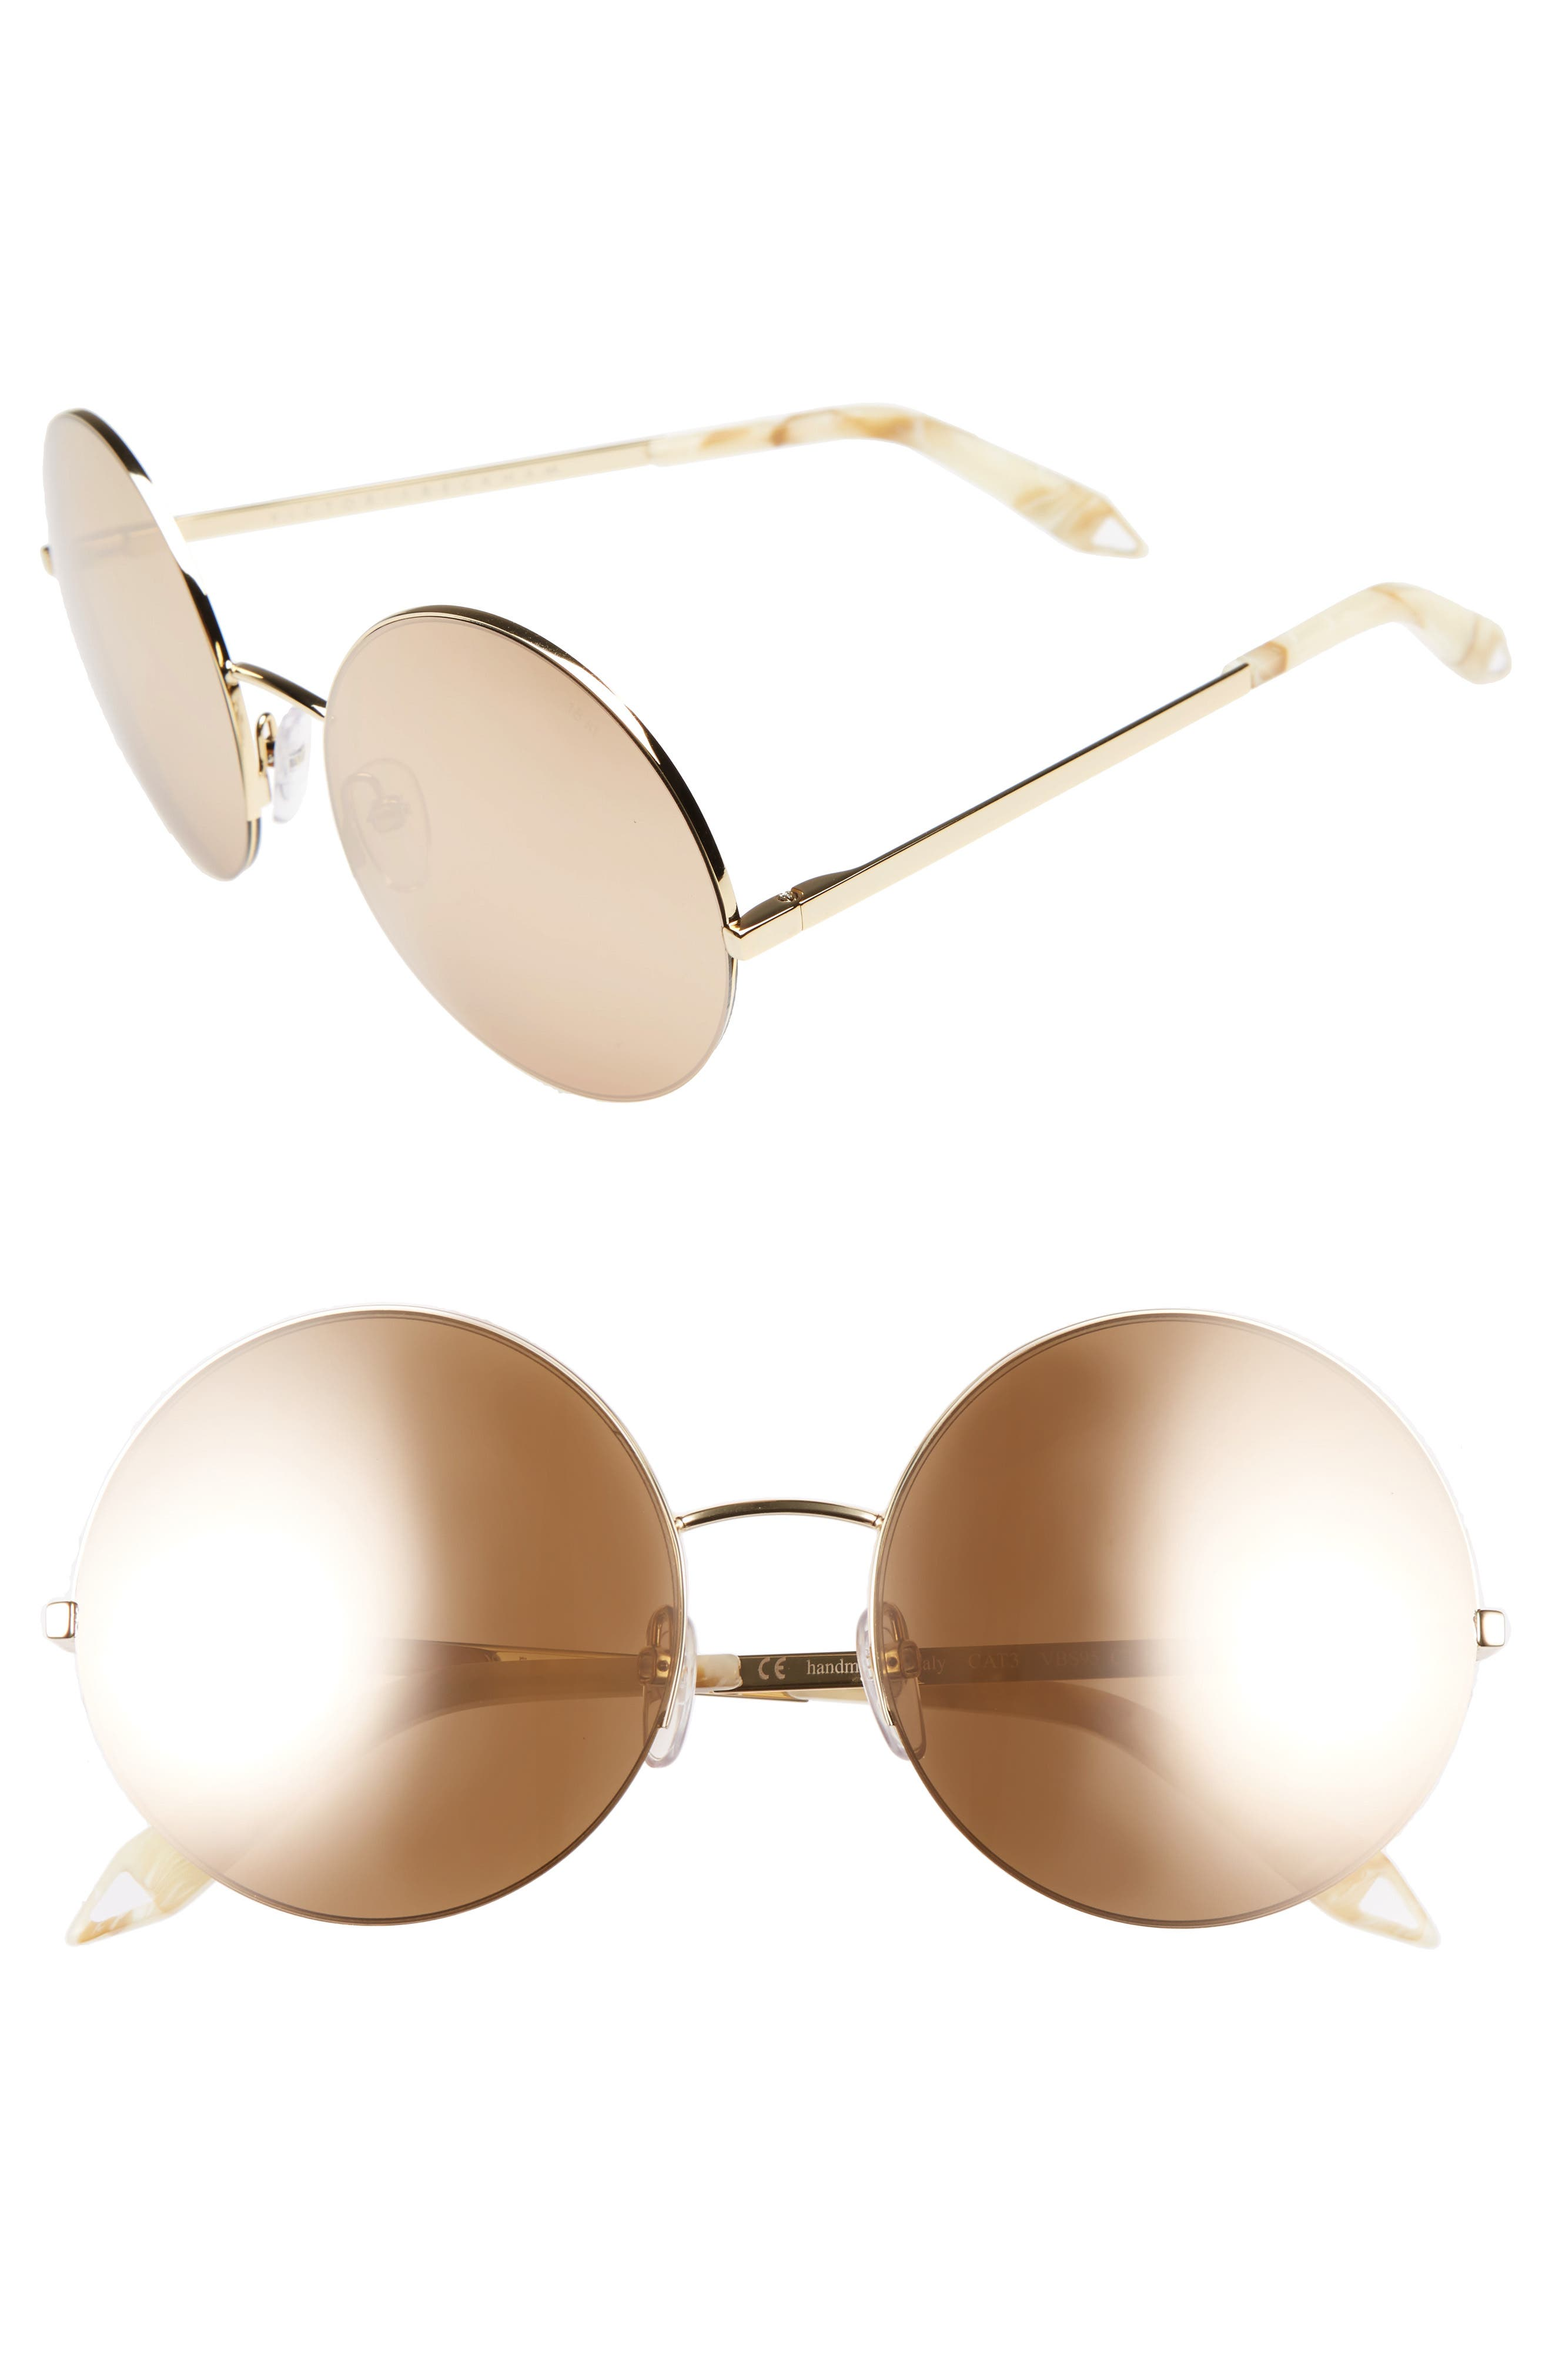 VICTORIA BECKHAM, 56mm Round Sunglasses, Main thumbnail 1, color, GOLD METALLIC/ GOLD MIRROR